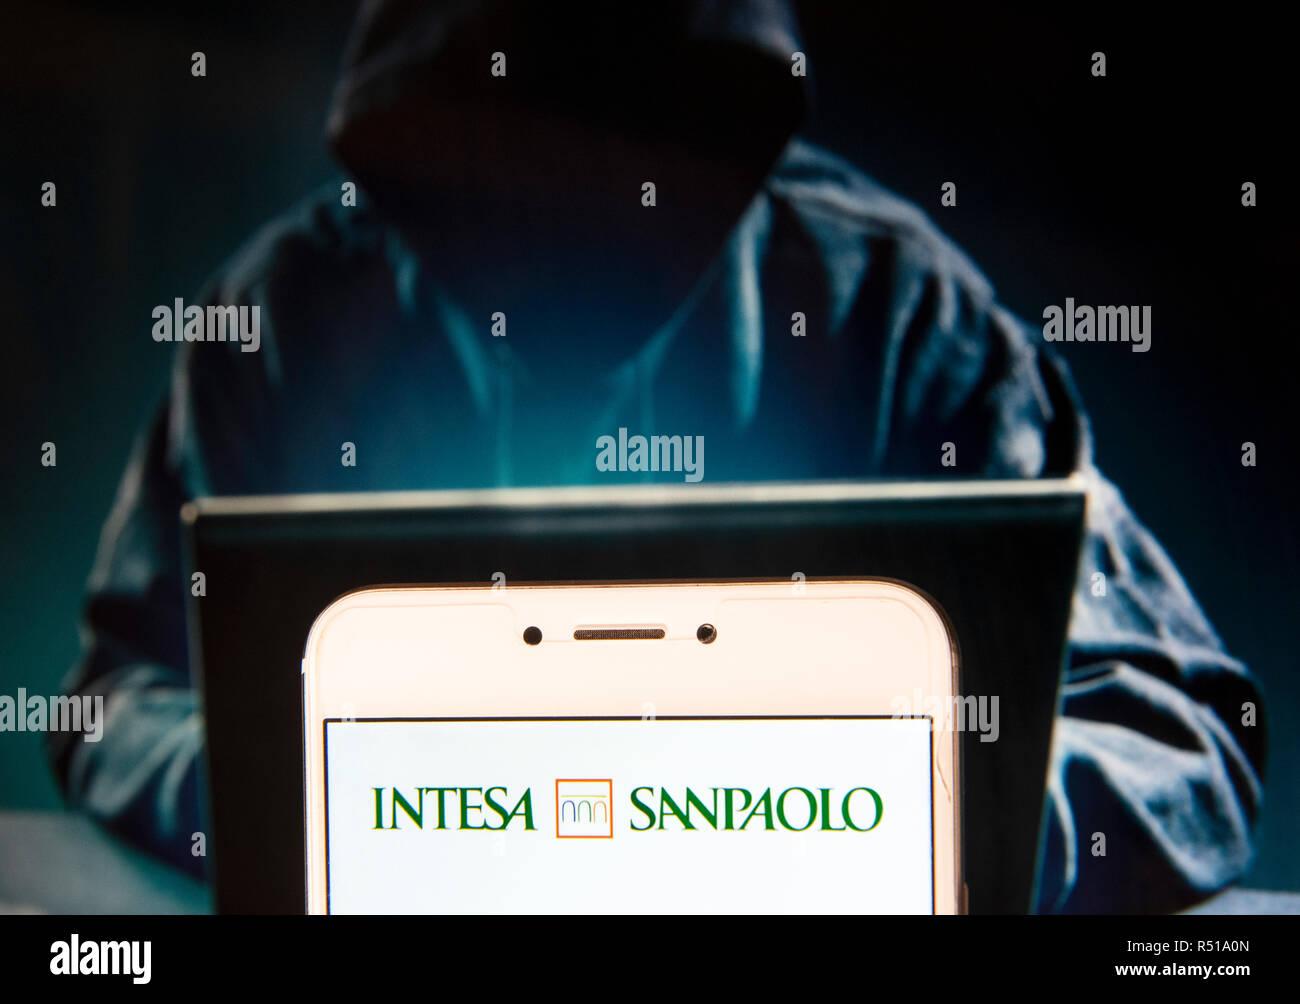 Italian banking group Intesa Sanpaolo logo is seen on an